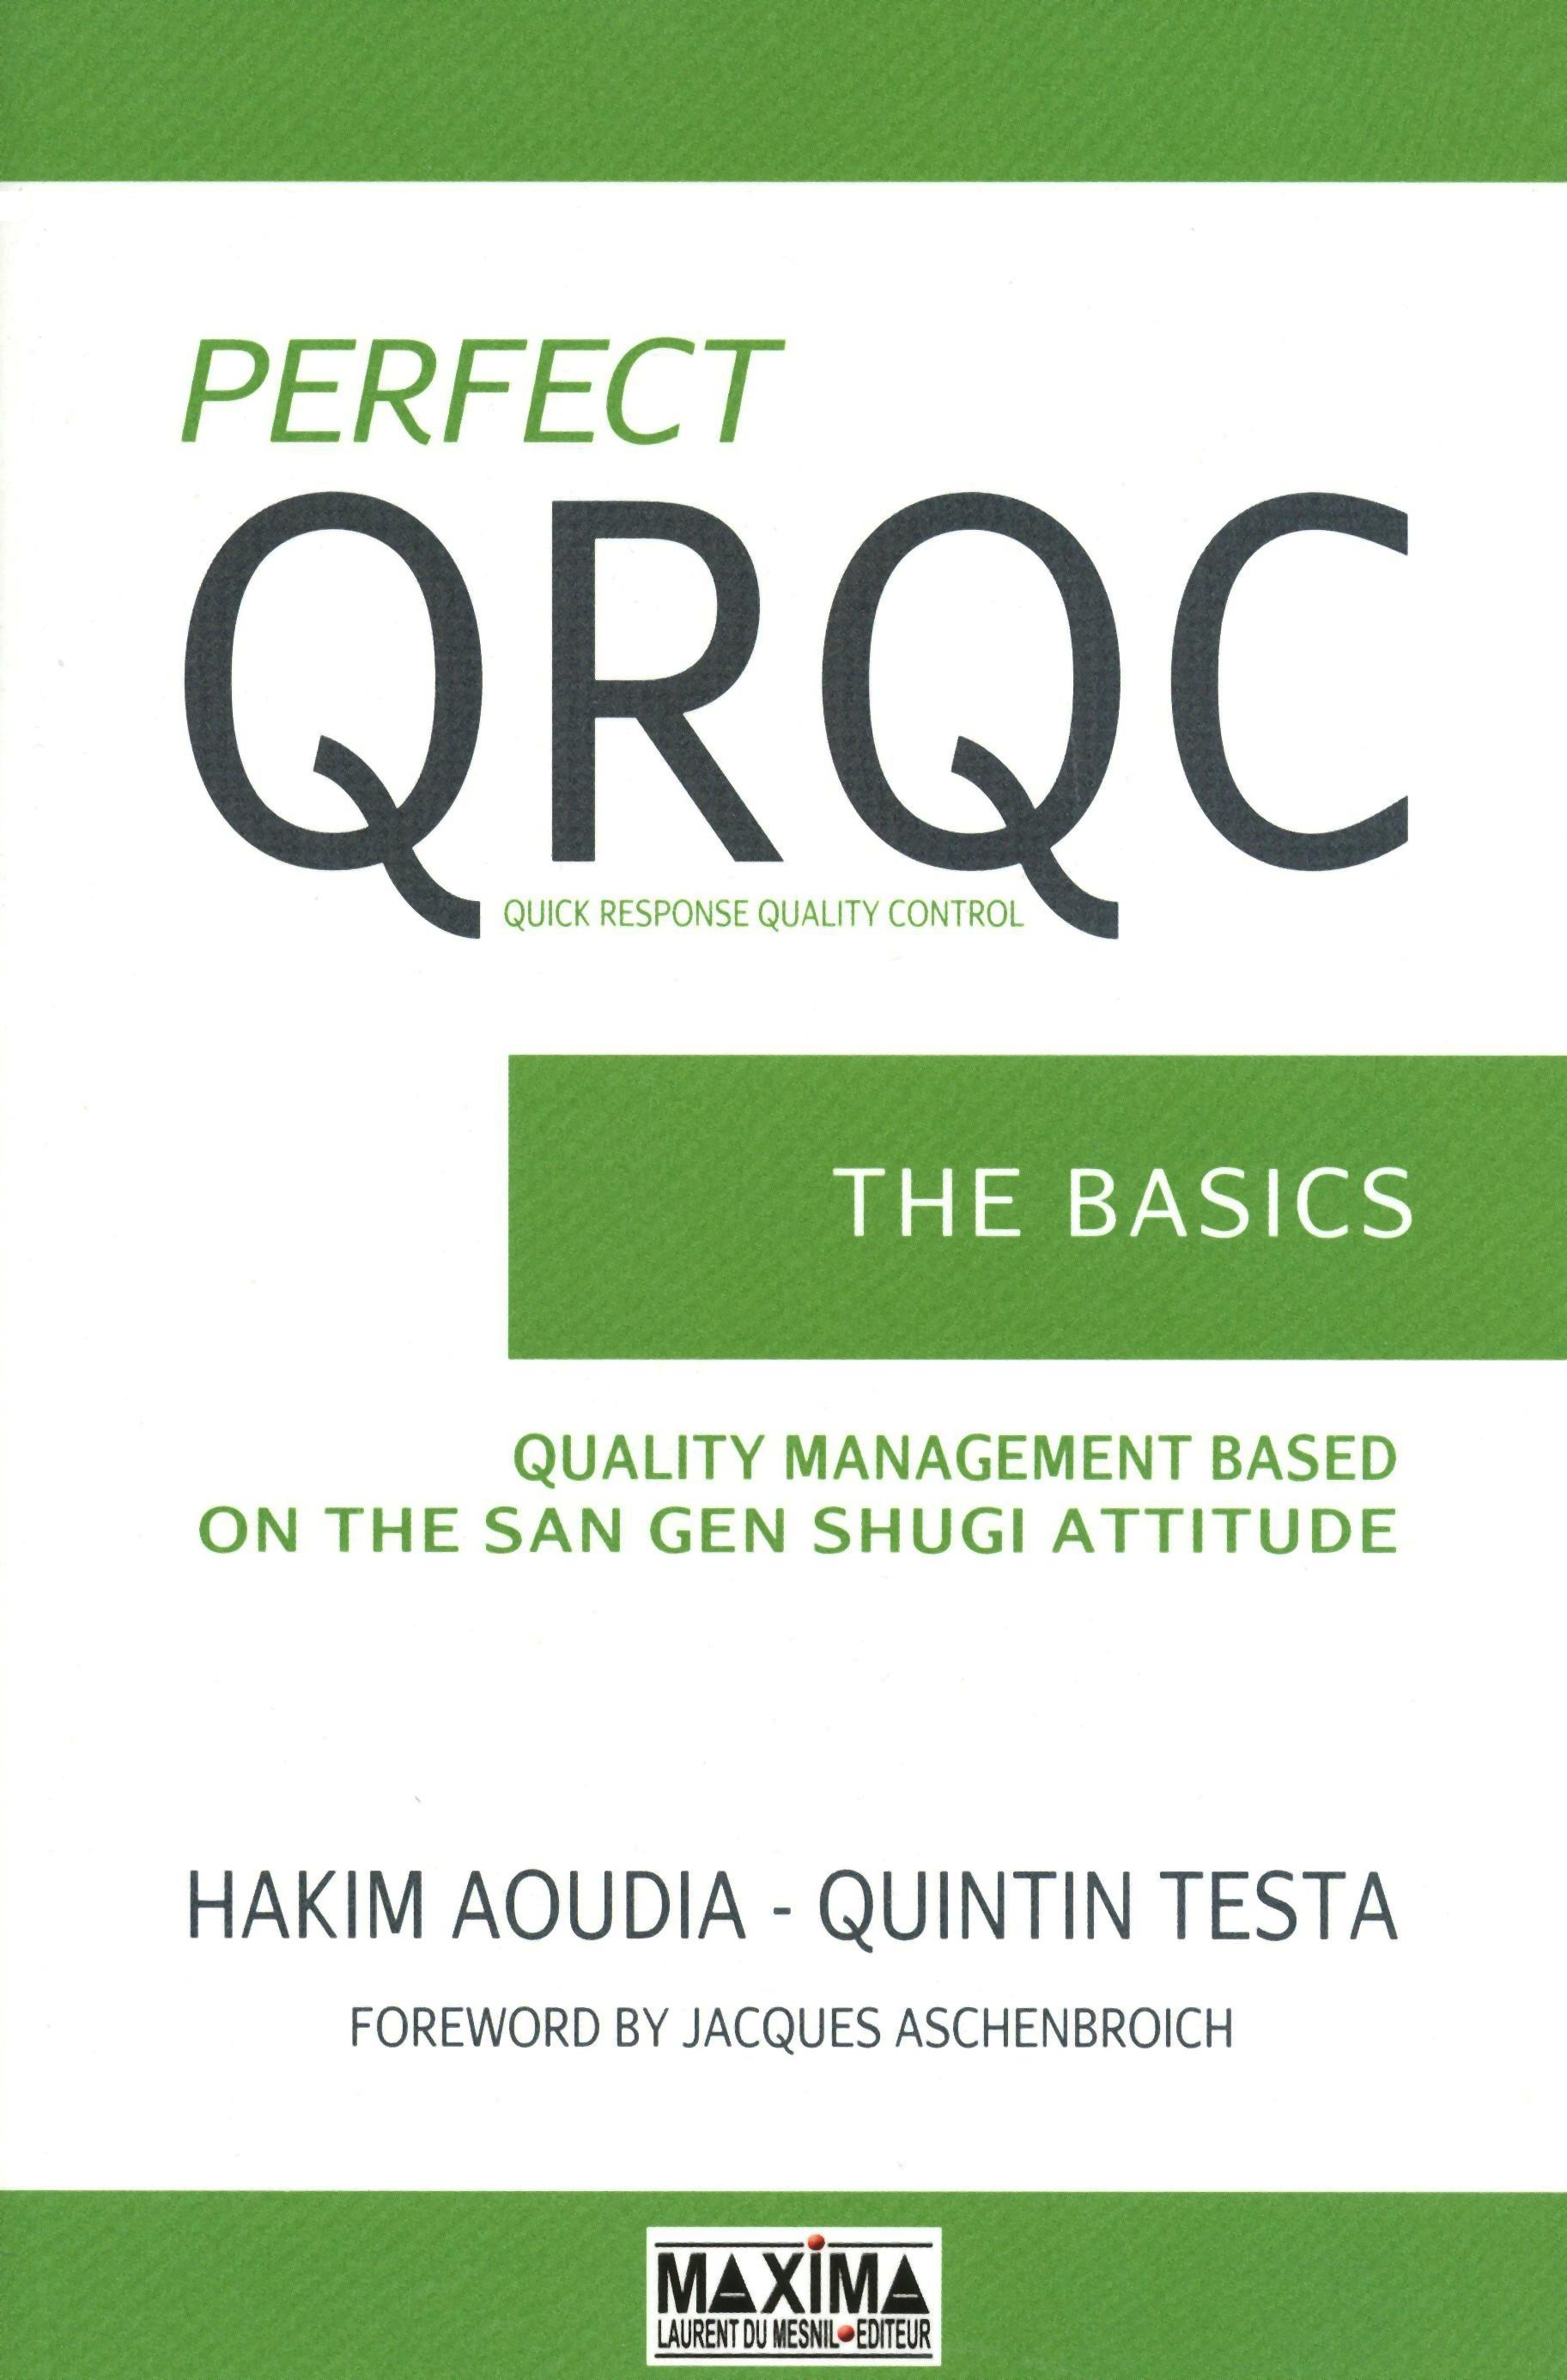 Perfect QRQC - The Basics, QUALITY MANAGEMENT BASED ON THE SAN GEN SHUGI ATTITUDE